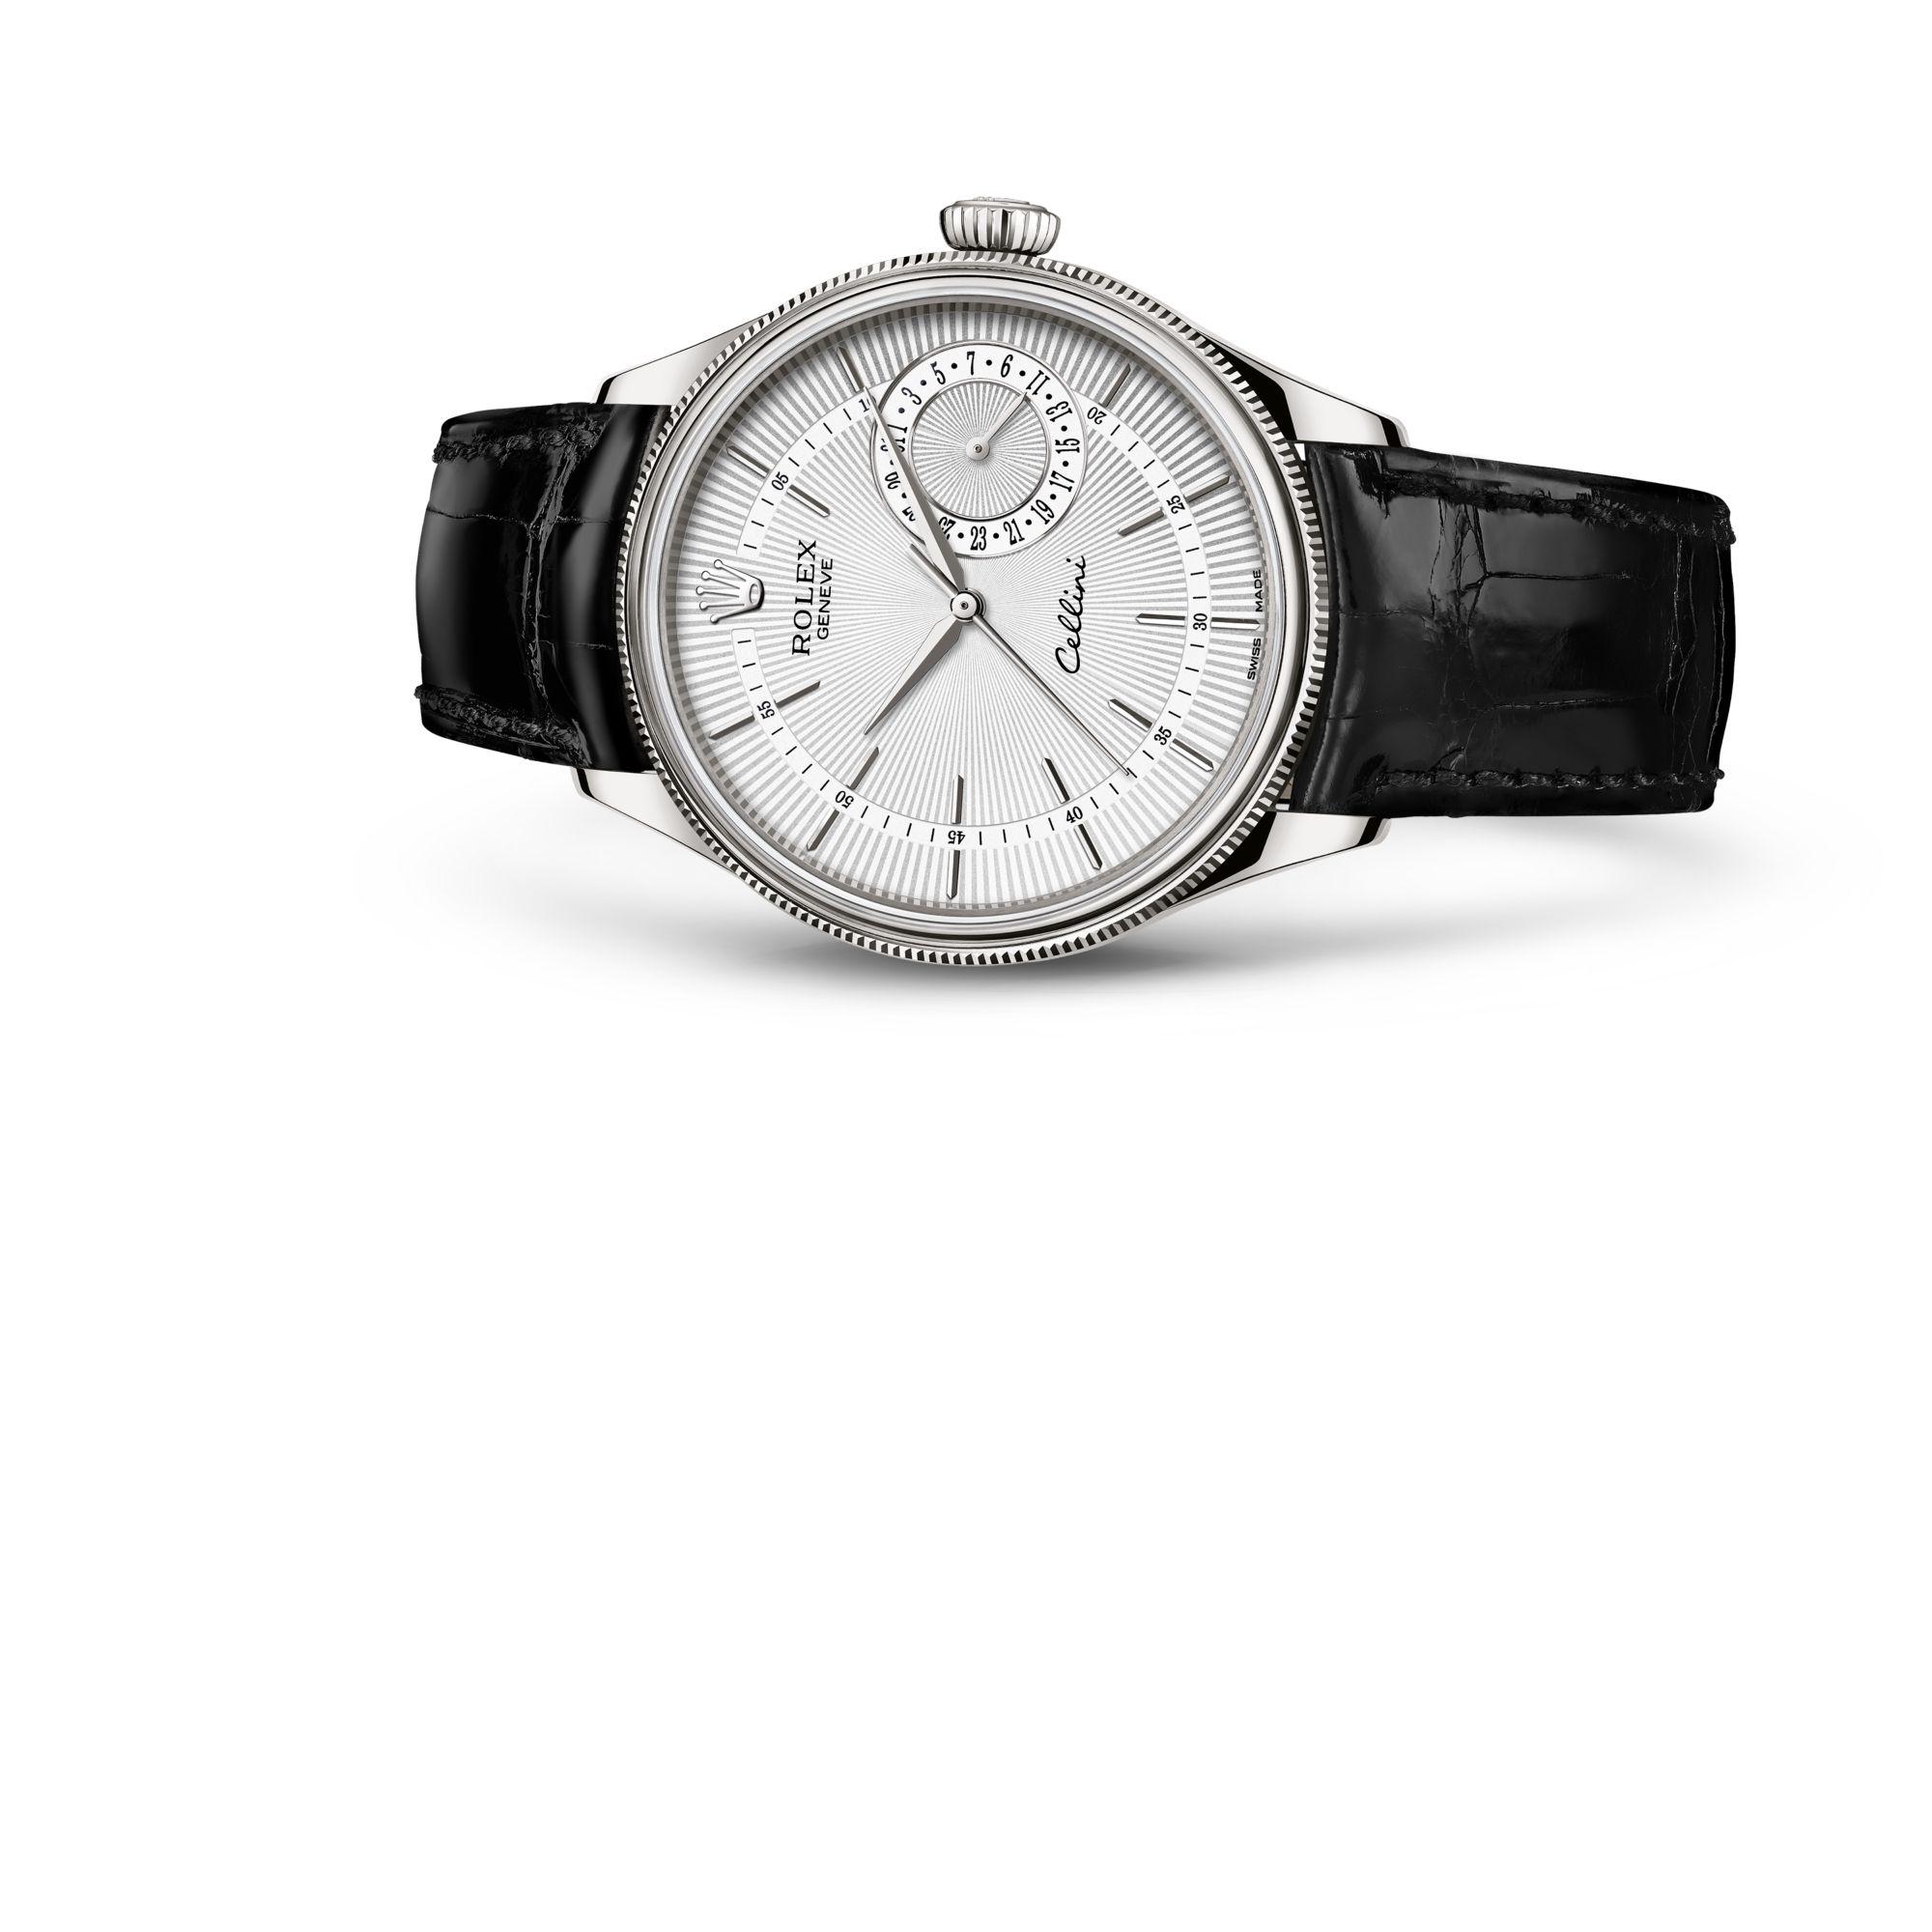 Rolex チェリーニ デイト M50519-0006